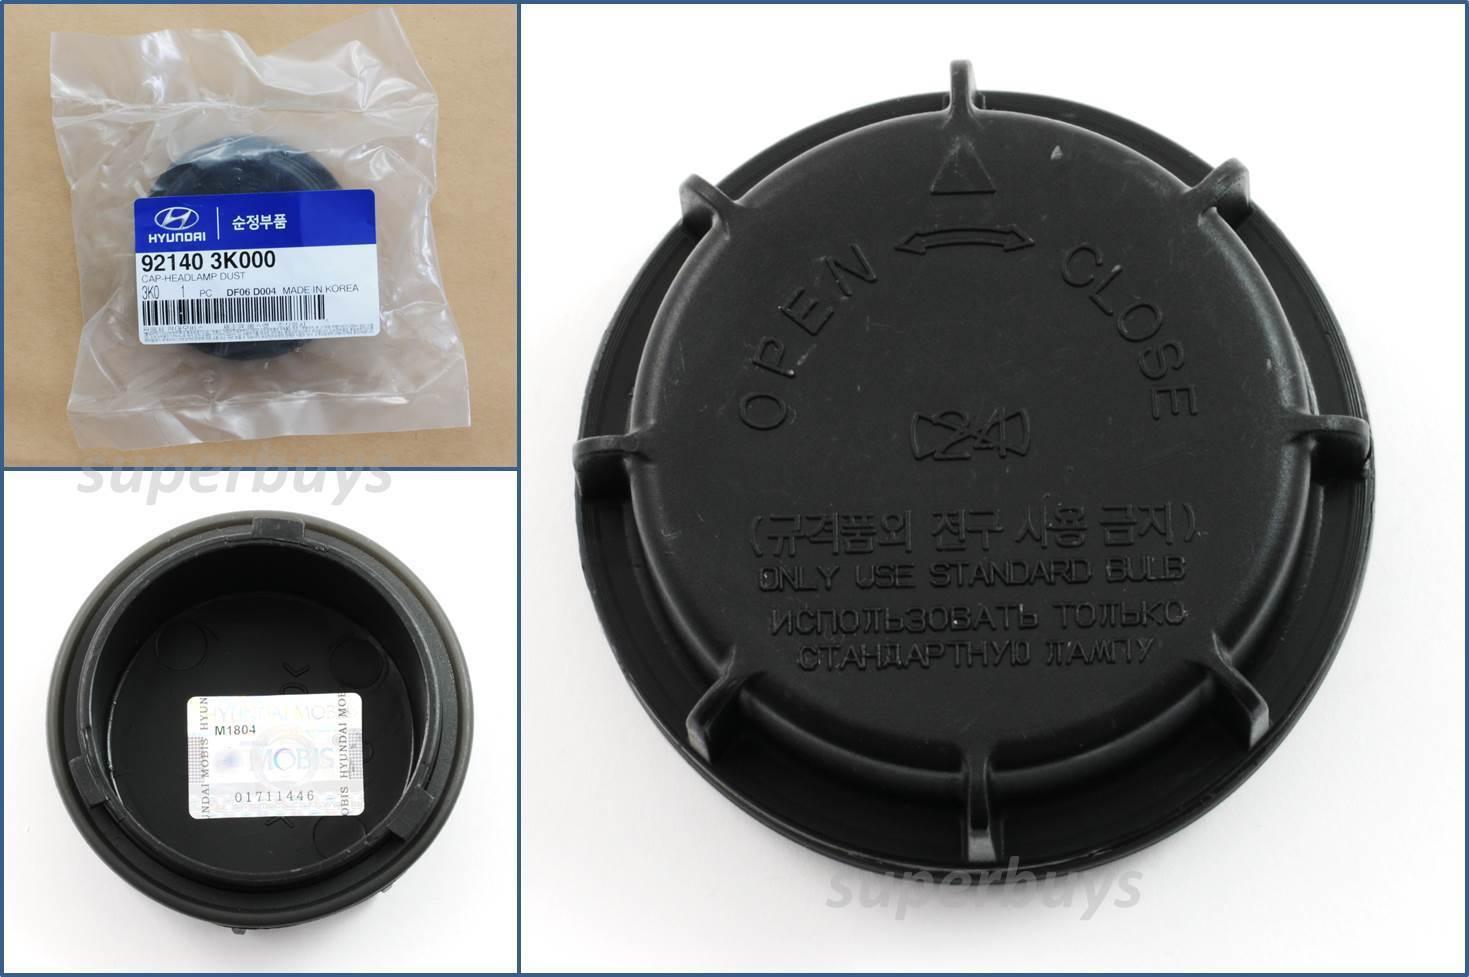 Car Parts - Part no. 921403K000 Genuine OEM Headlamp Cap Dust Cover Hyundai KIA Vehicles Car